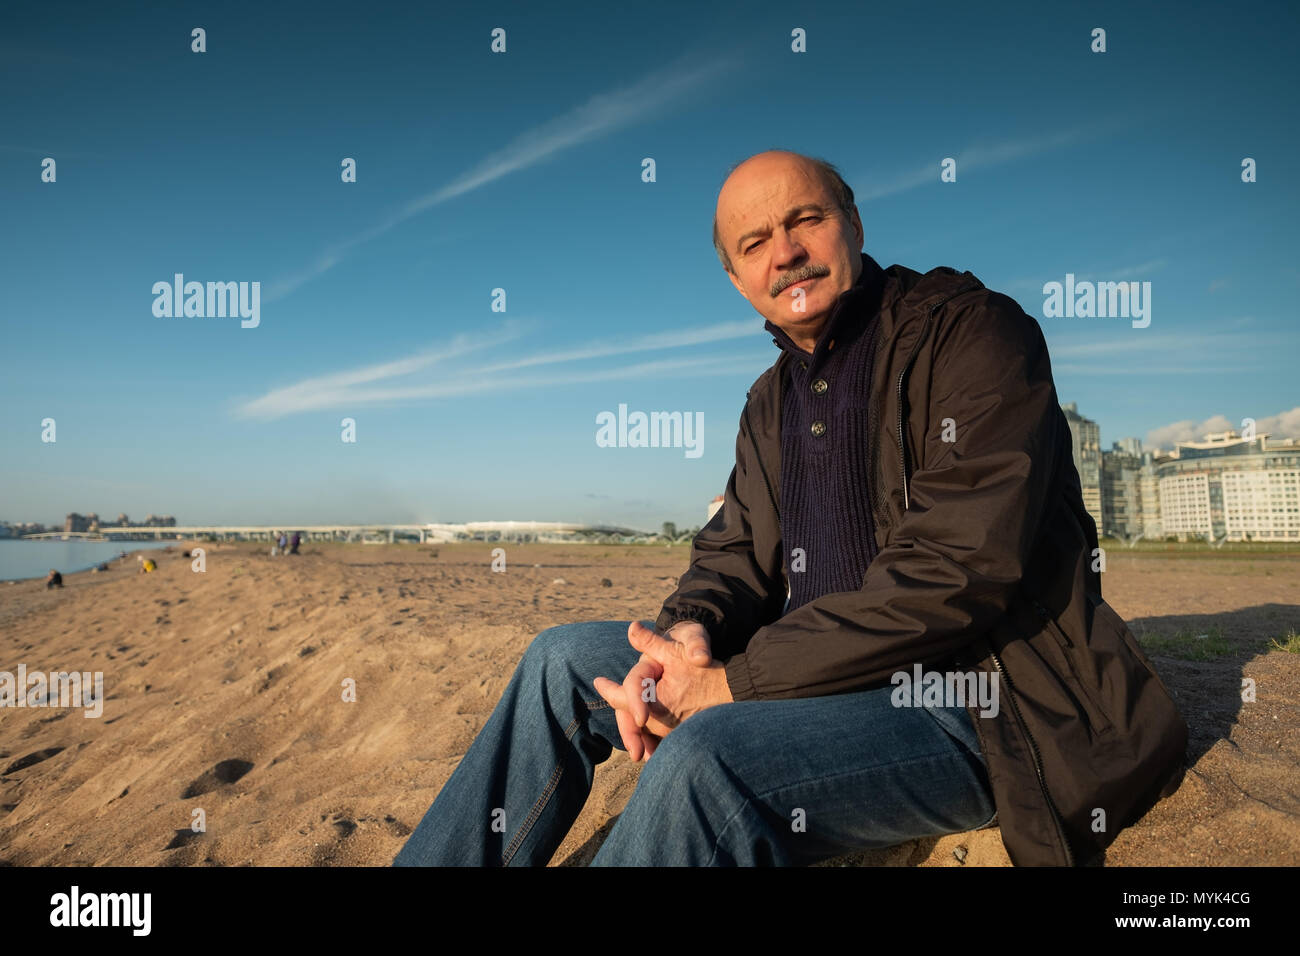 Retrato de un hombre superior al aire libre Imagen De Stock